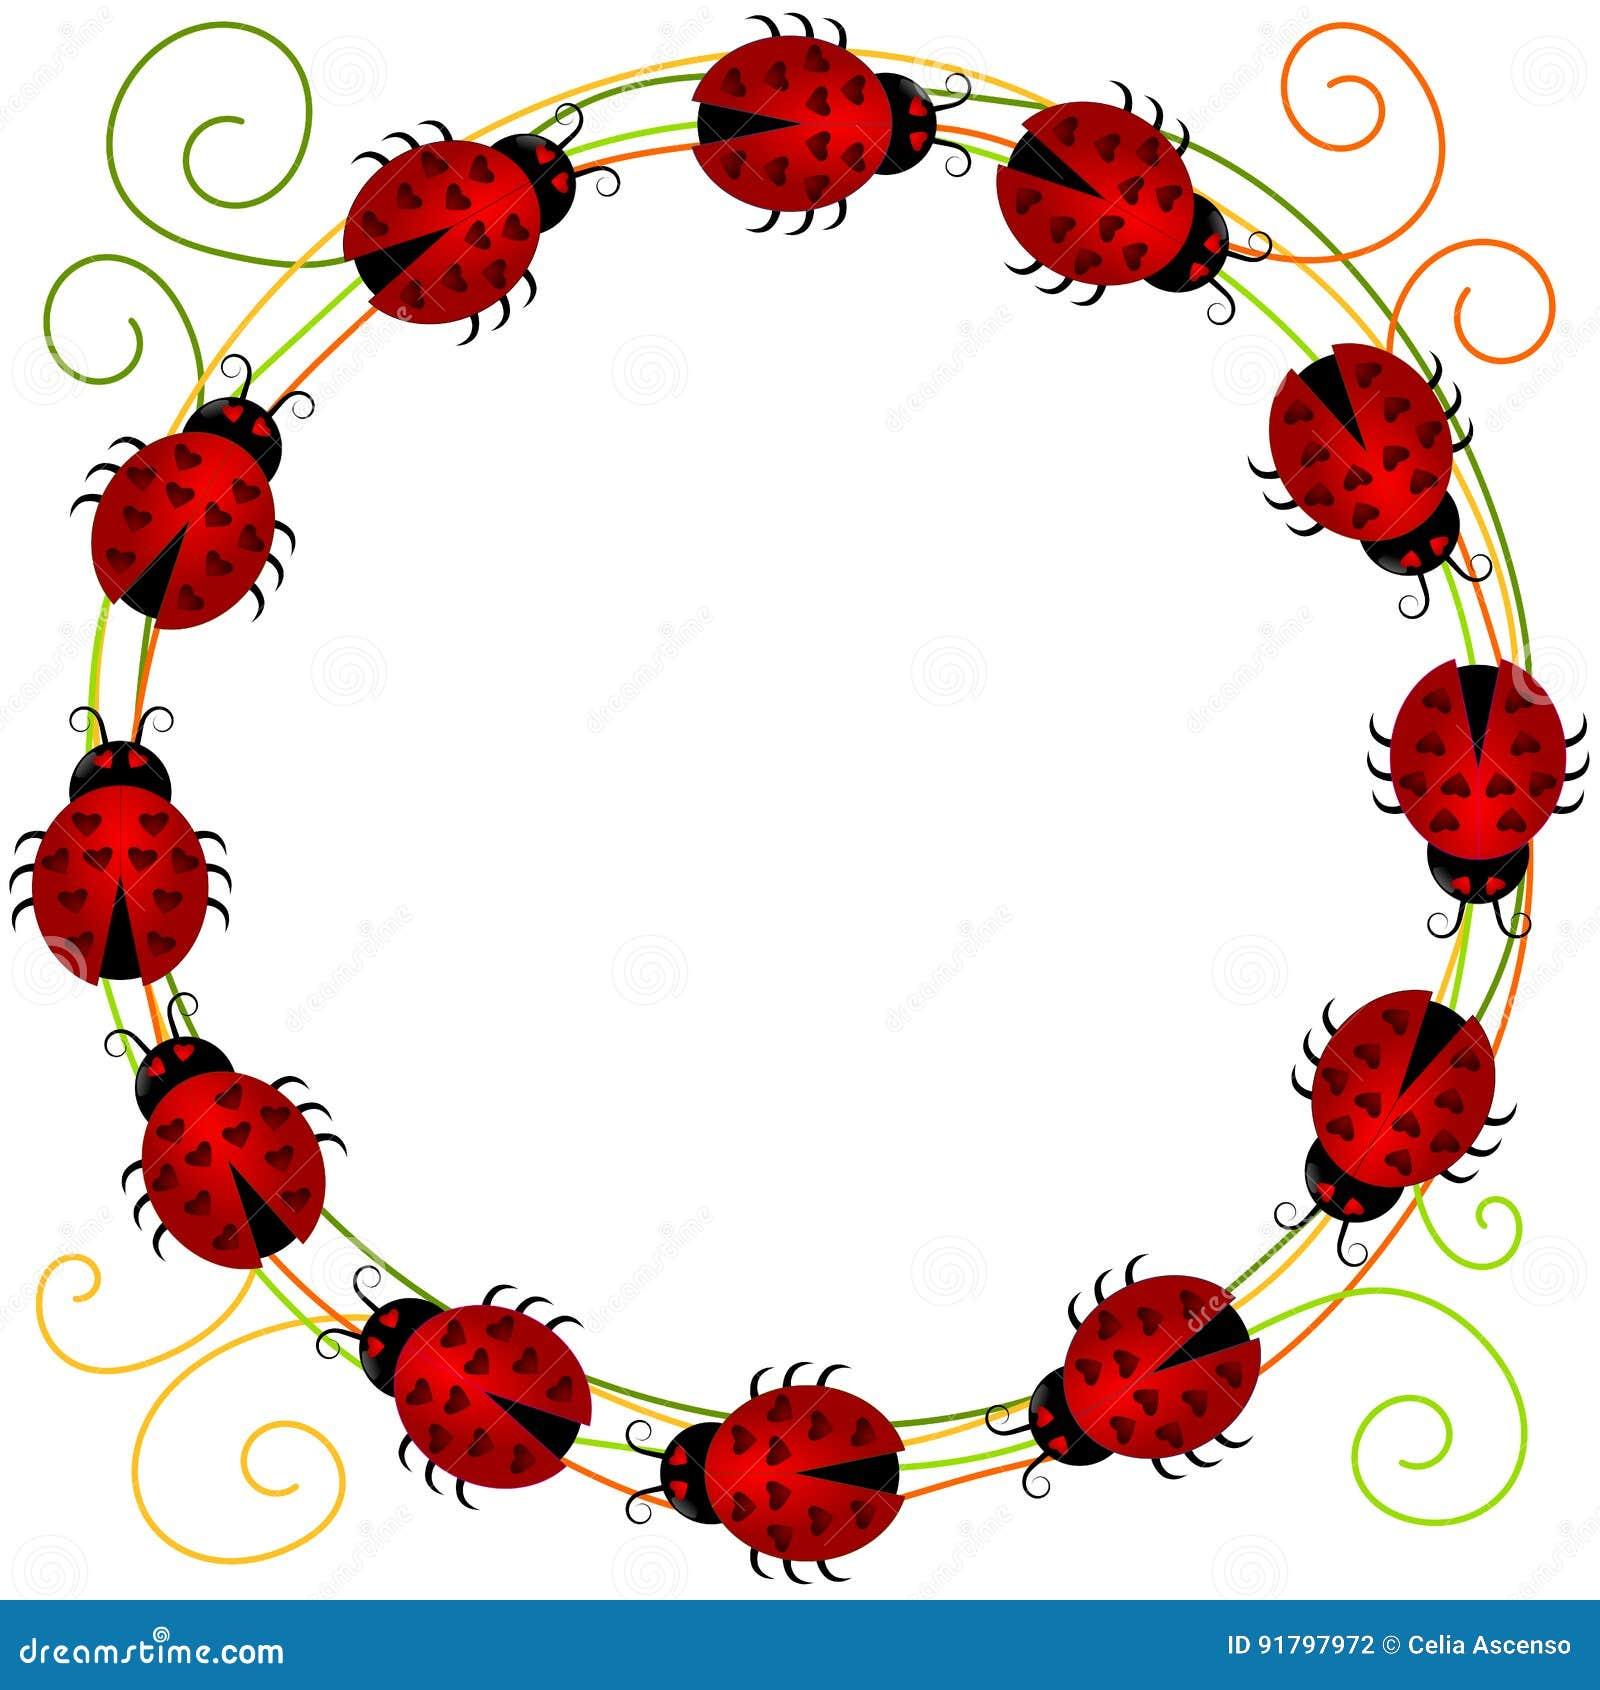 Ladybugs border frame stock illustration. Illustration of clipart ...